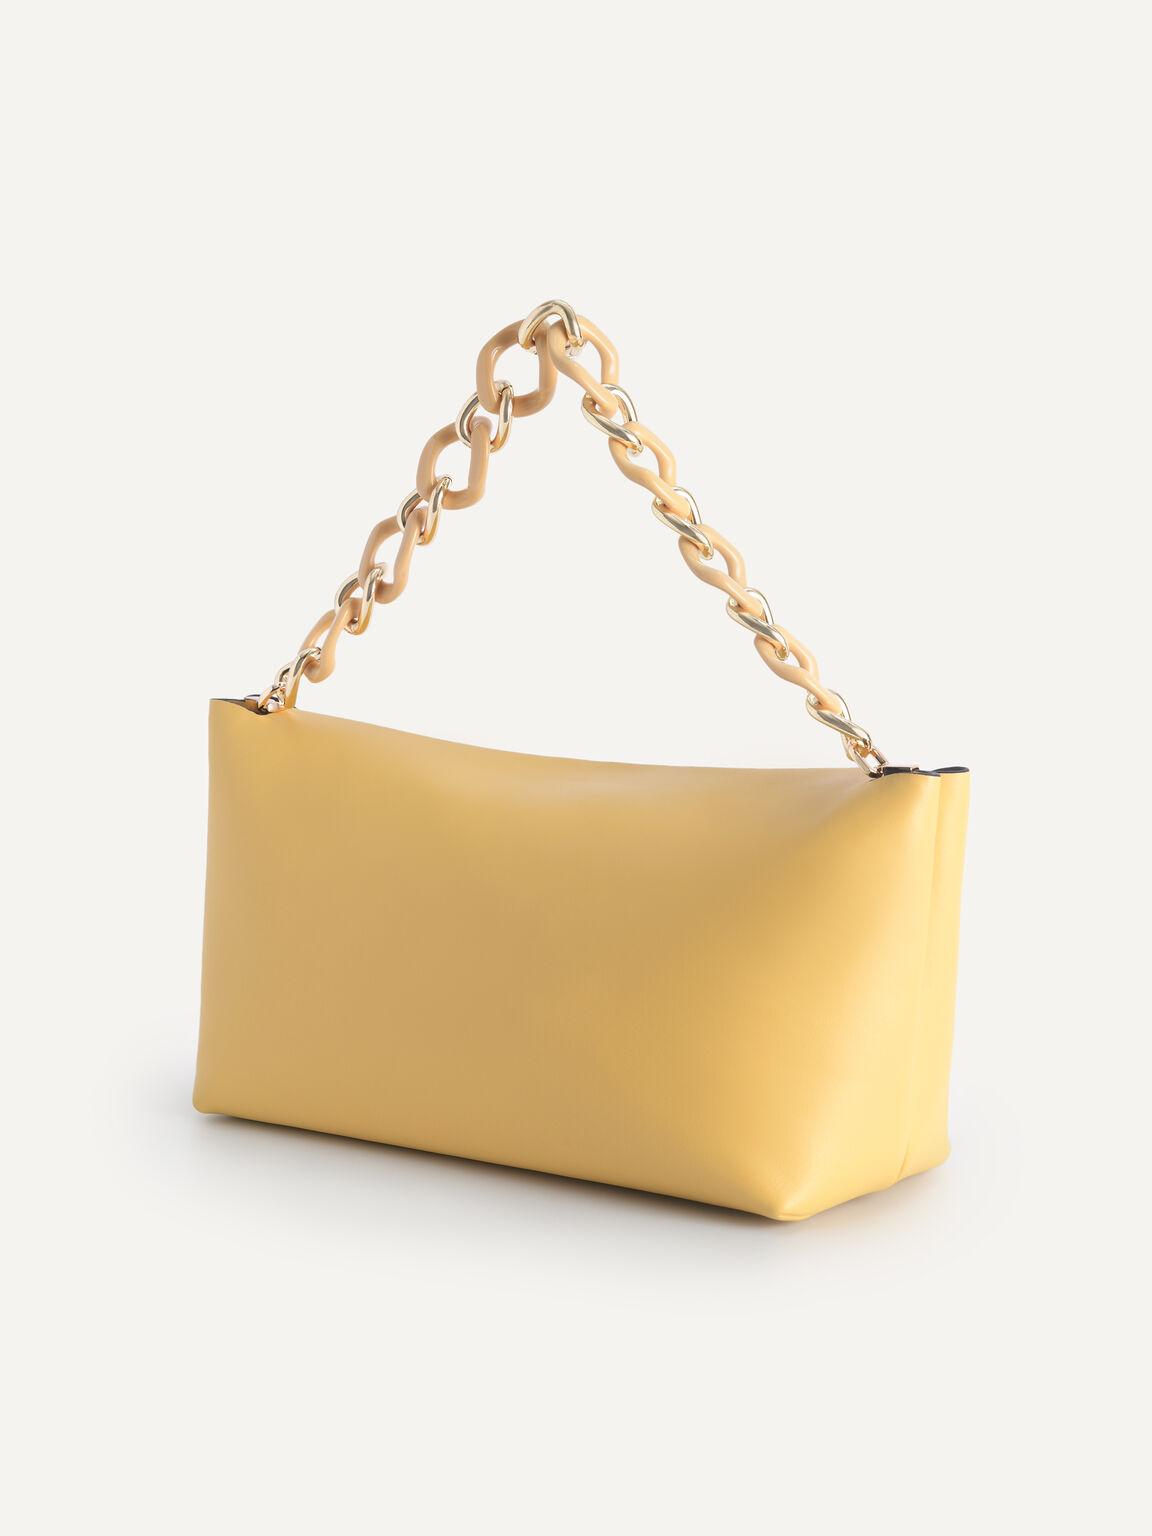 Leather Hobo Top Handle Bag, Sand, hi-res